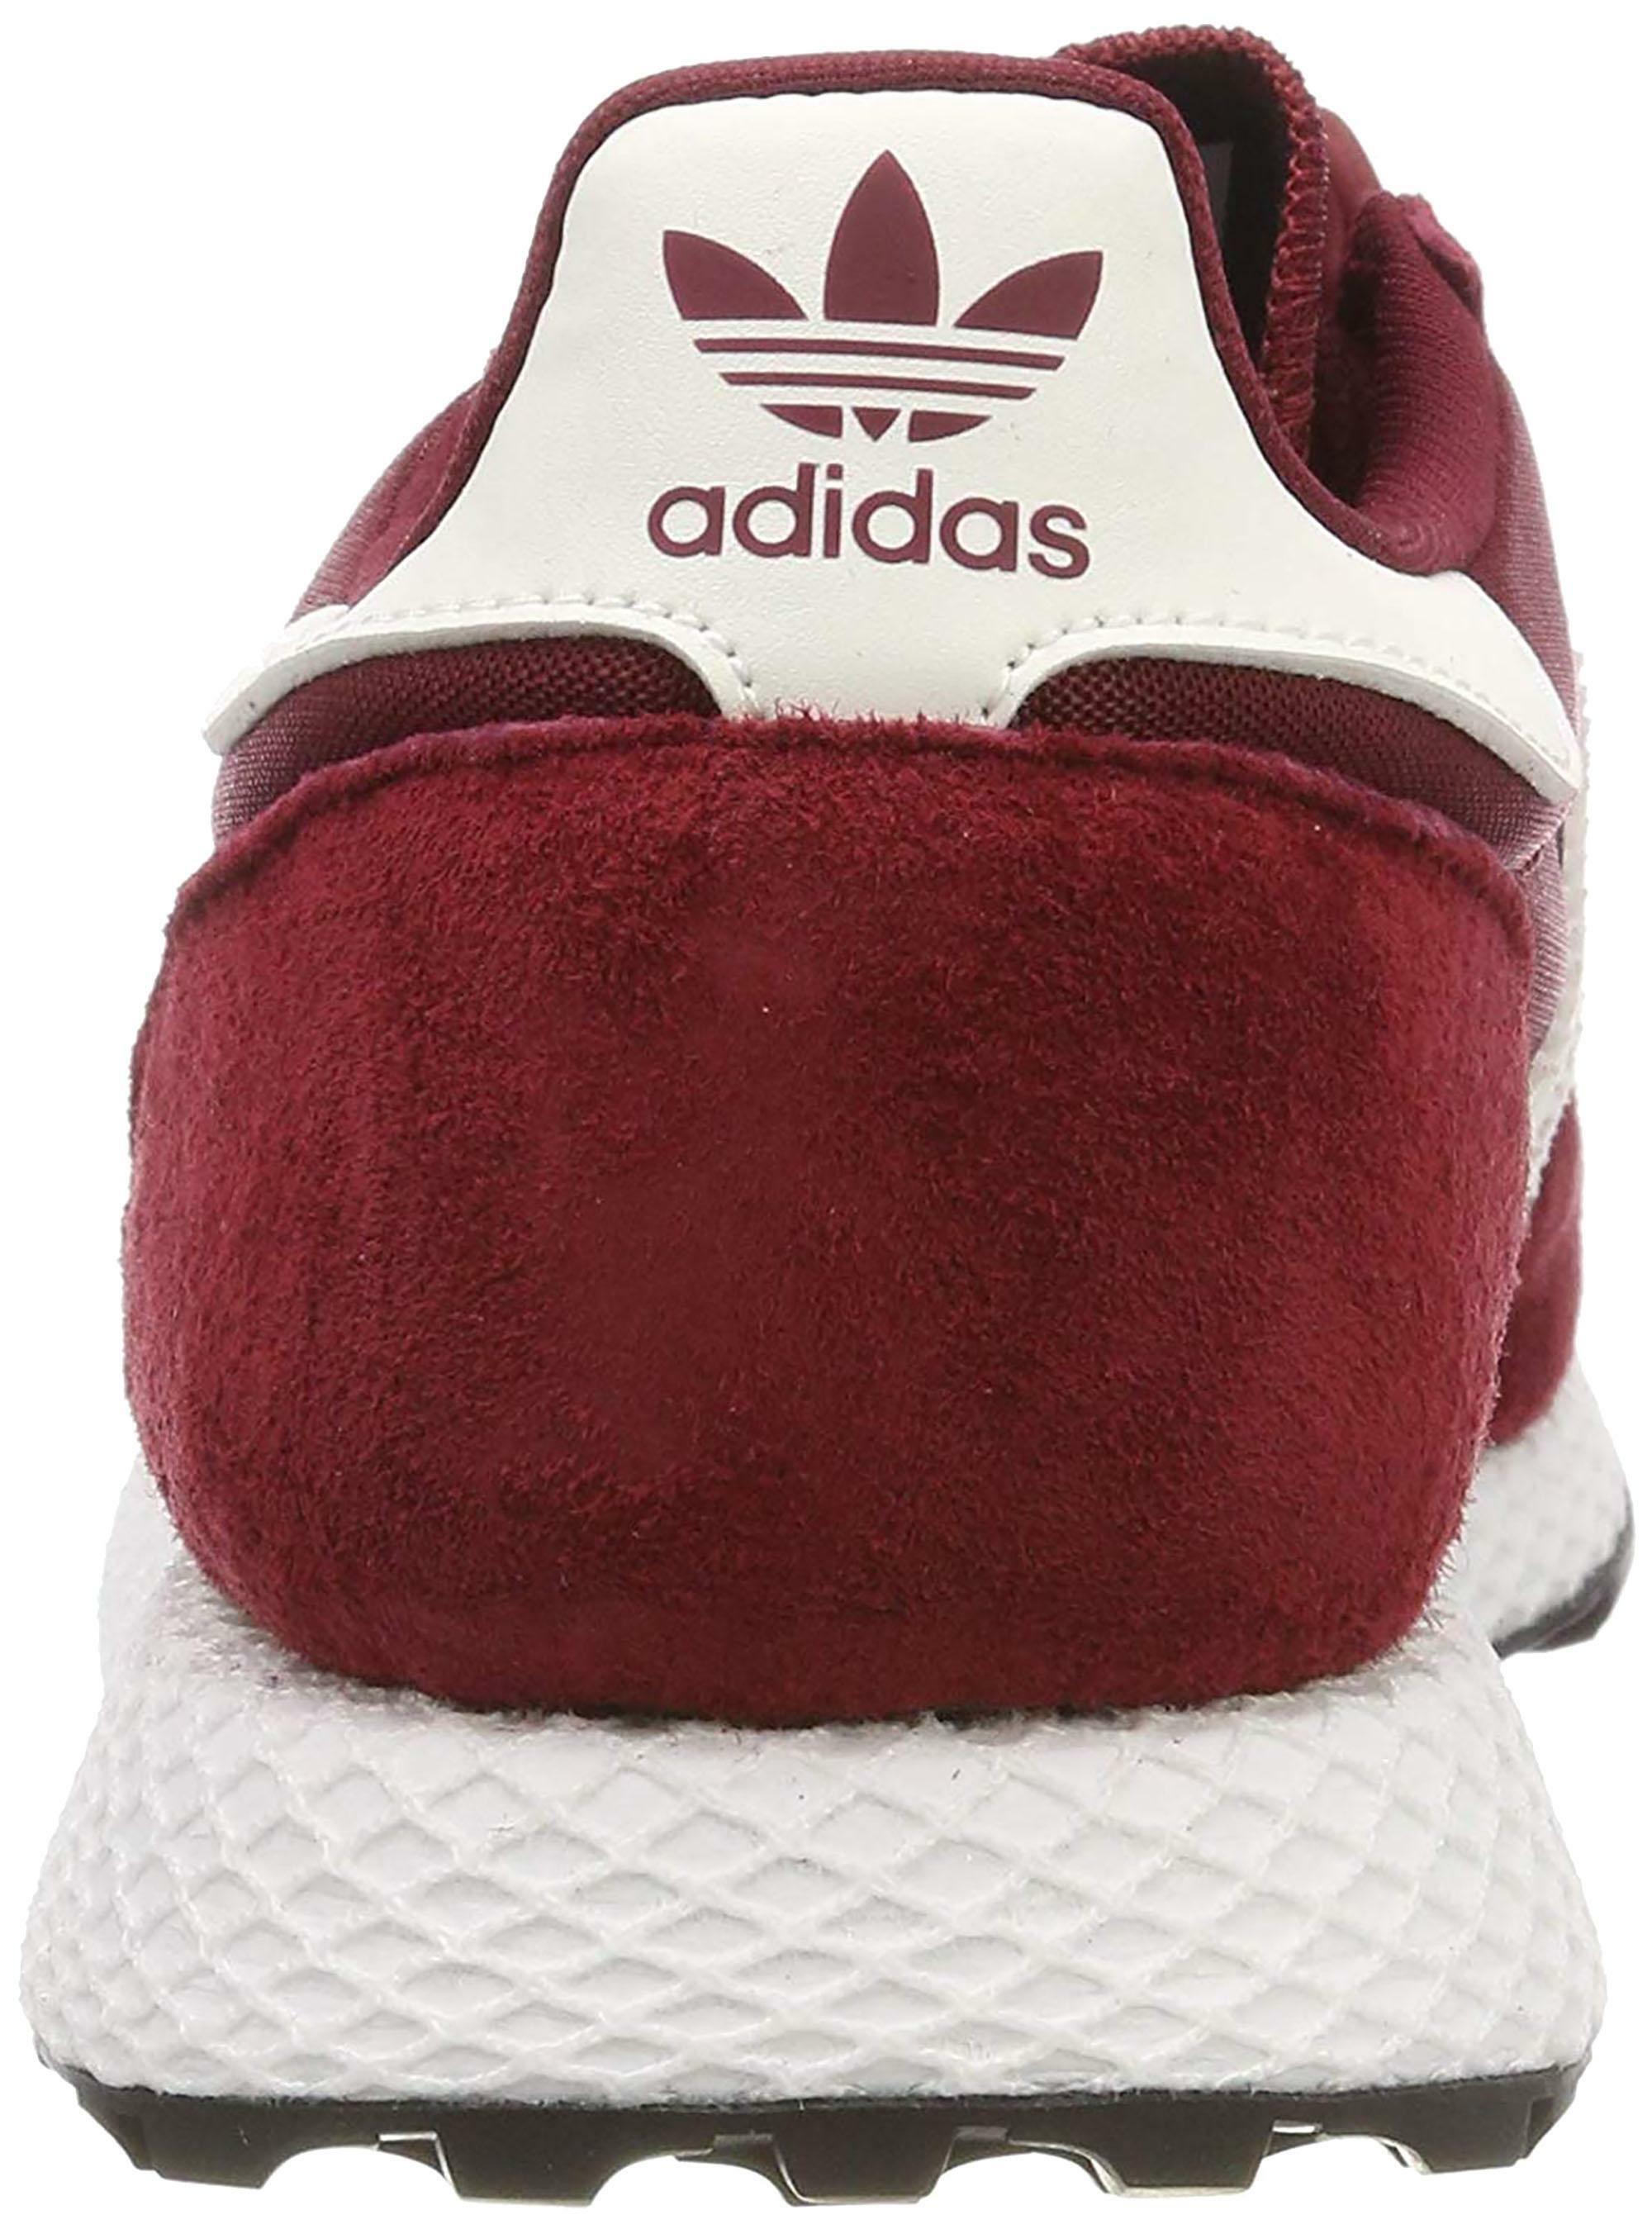 adidas rosse scarpe uomo